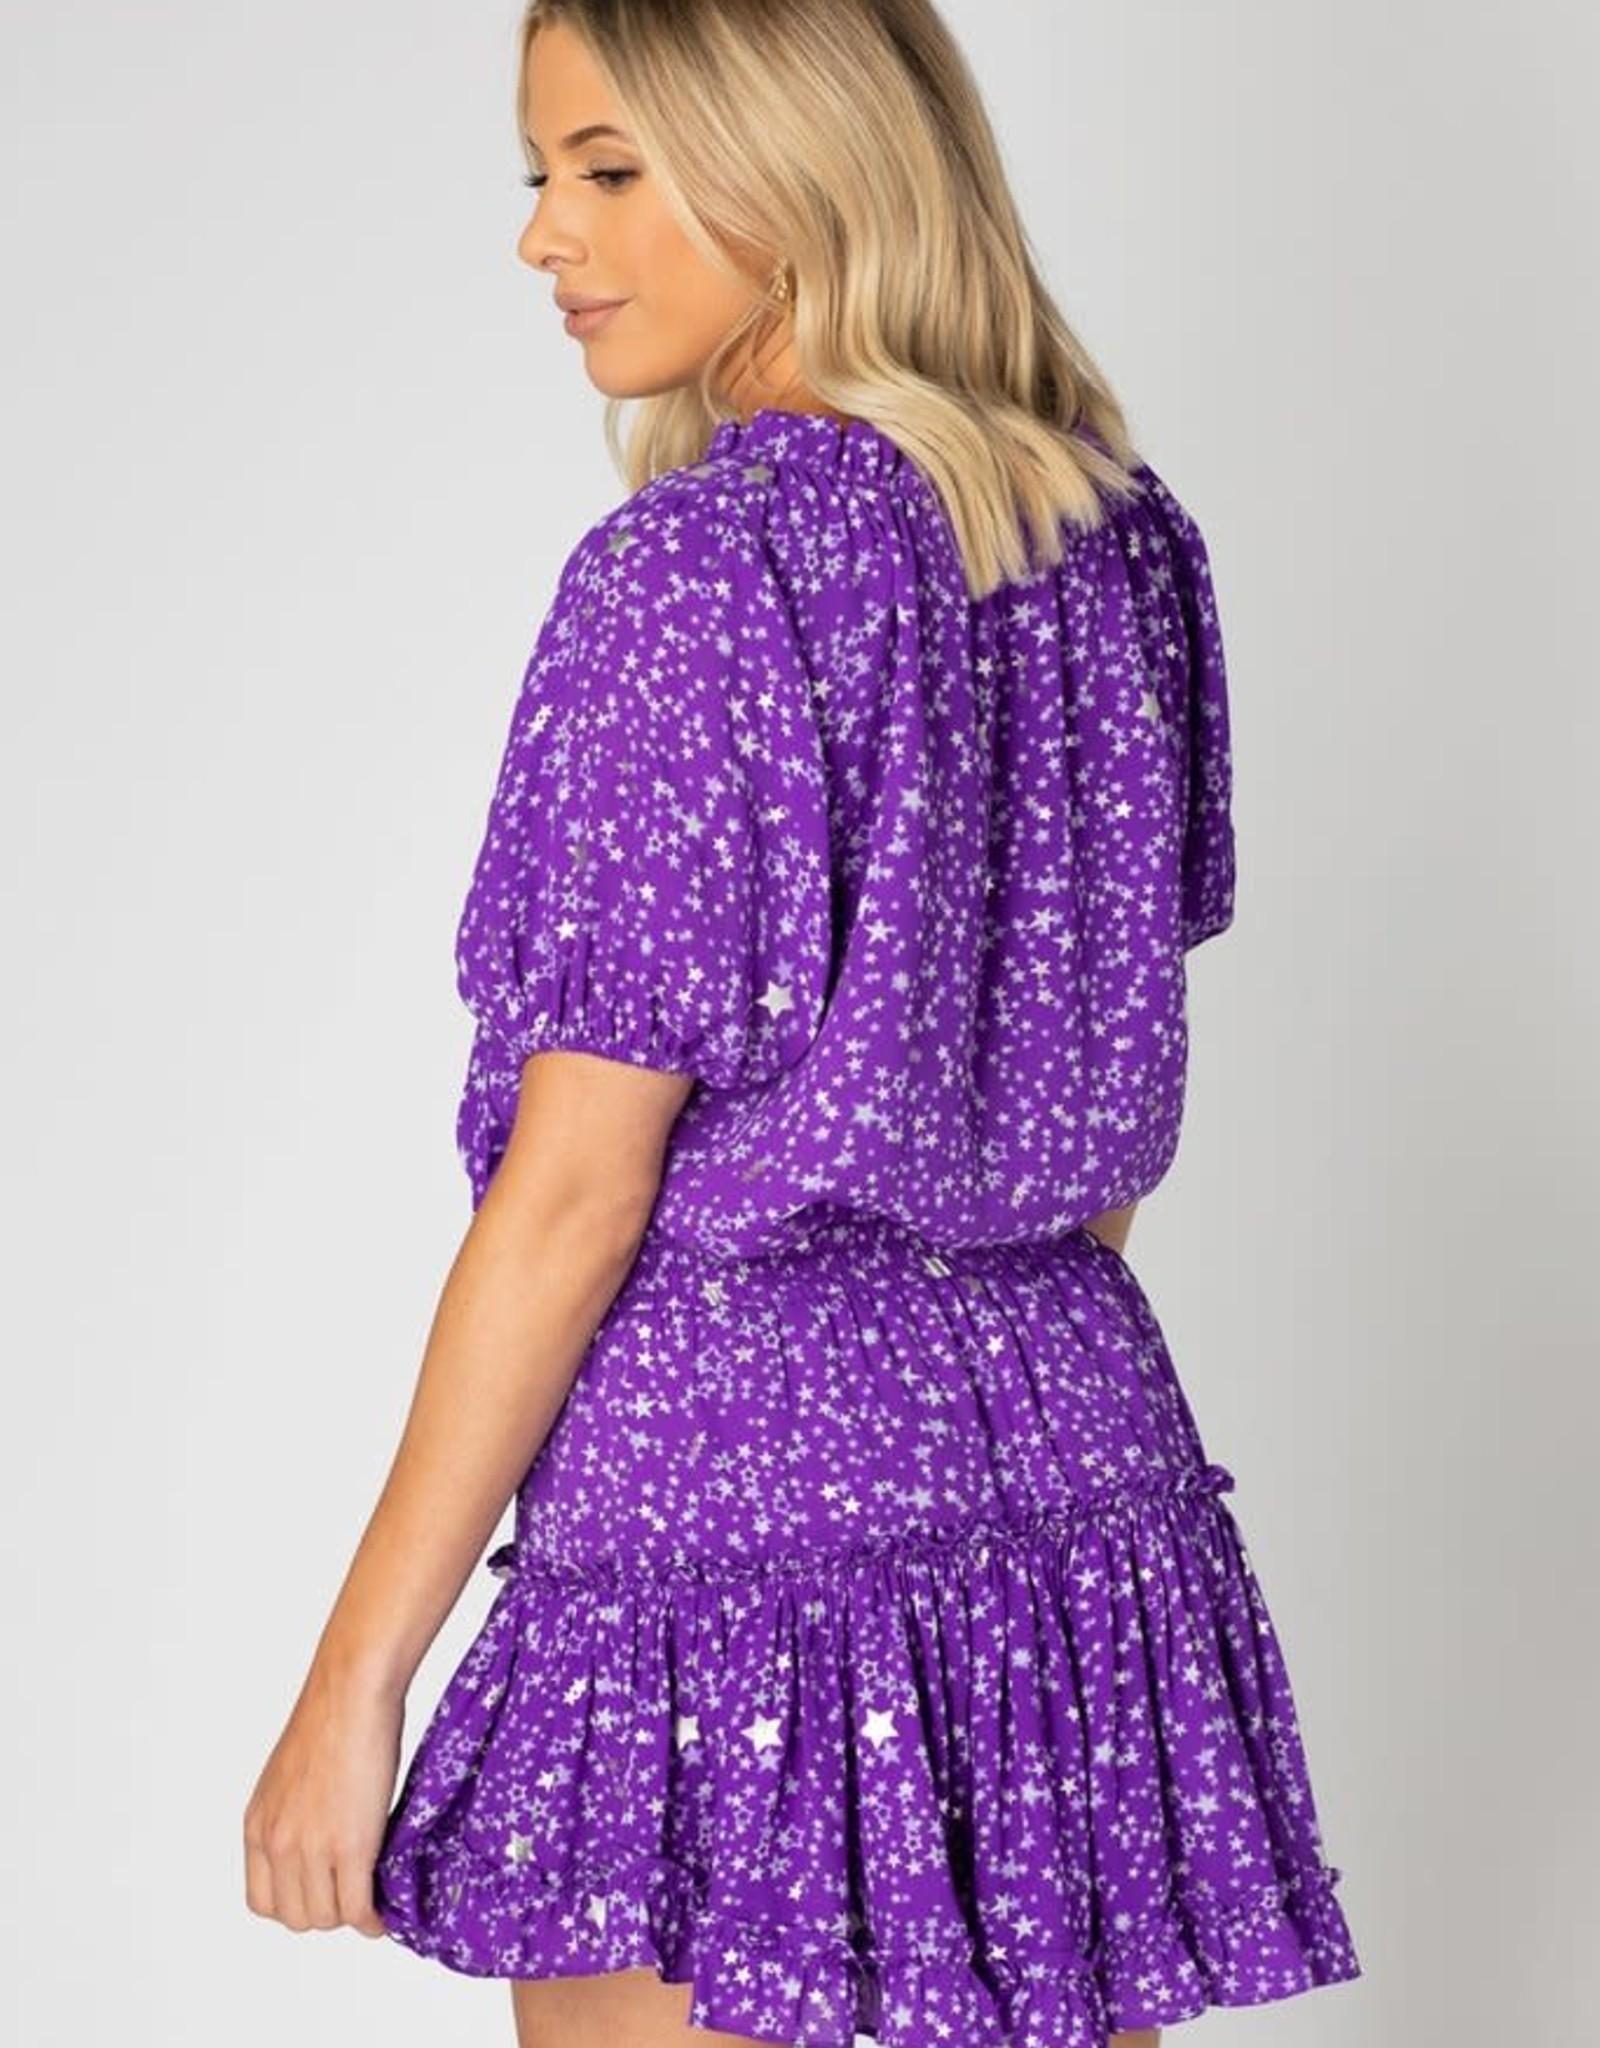 Ray Star Ultraviolet Dress